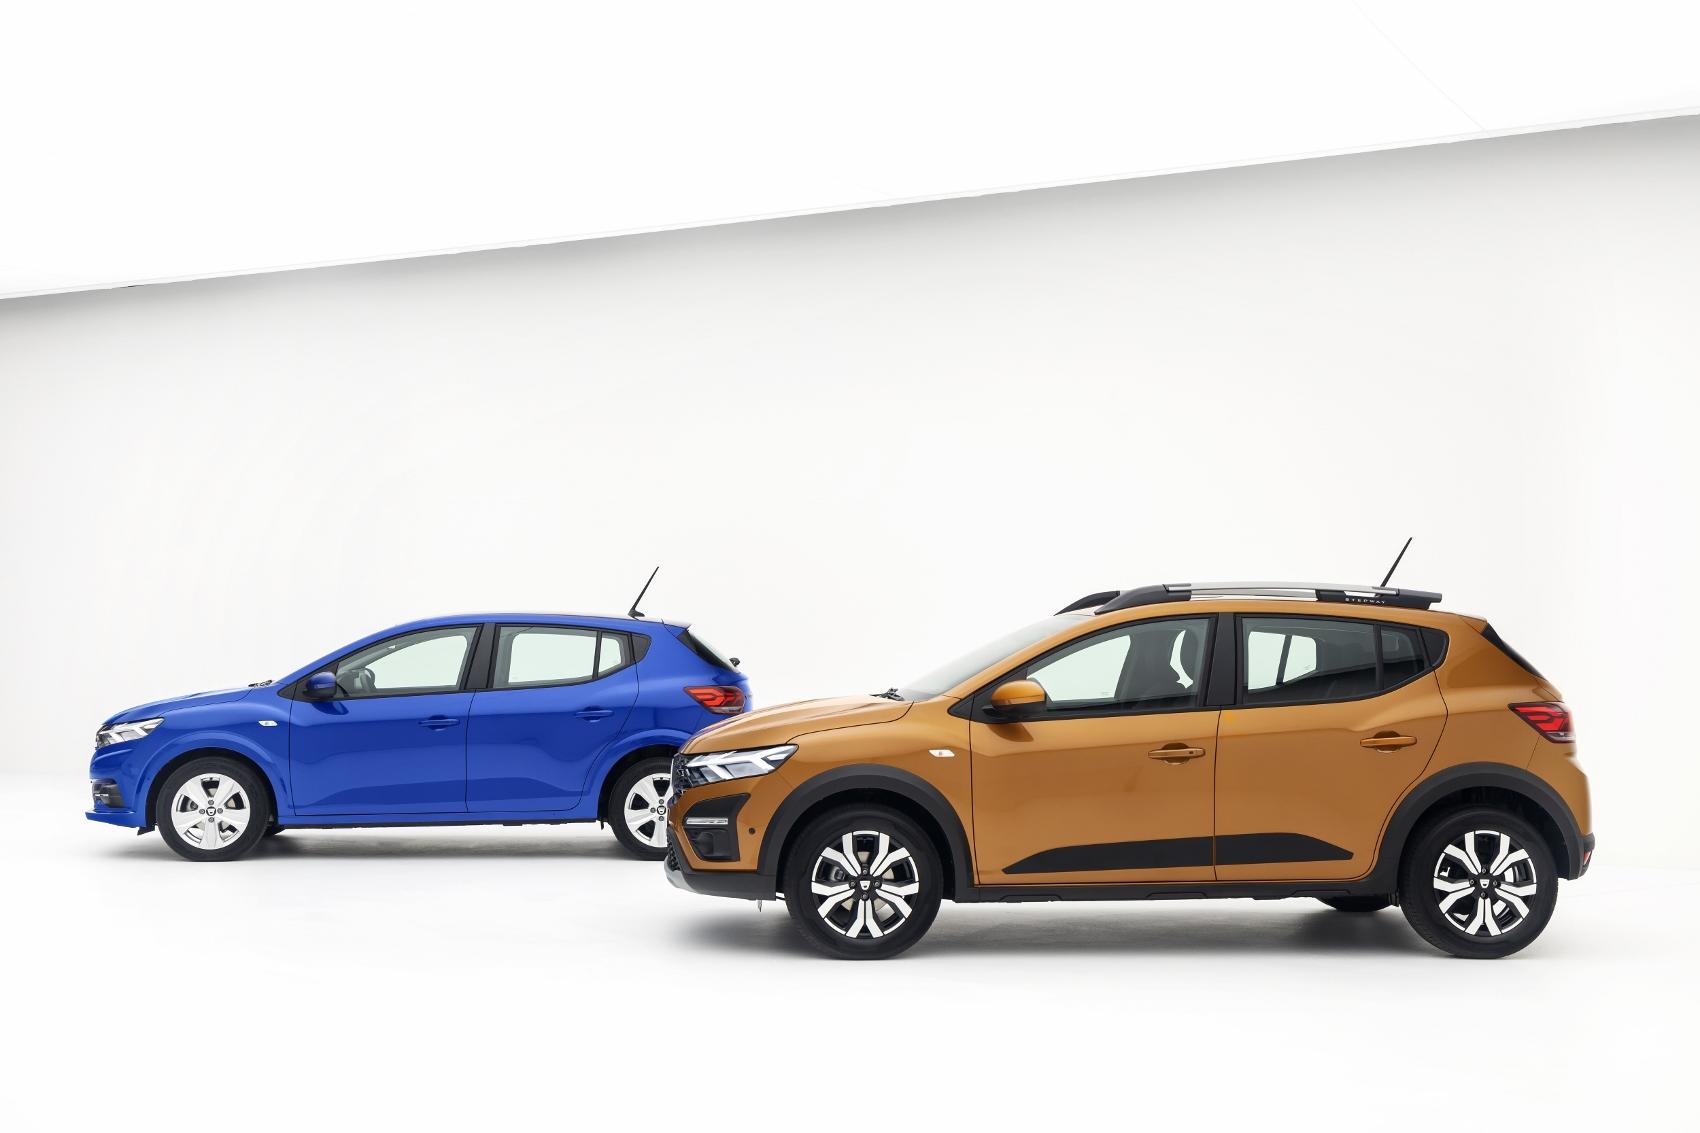 2020 - New Dacia Range (1) (1700x1133)